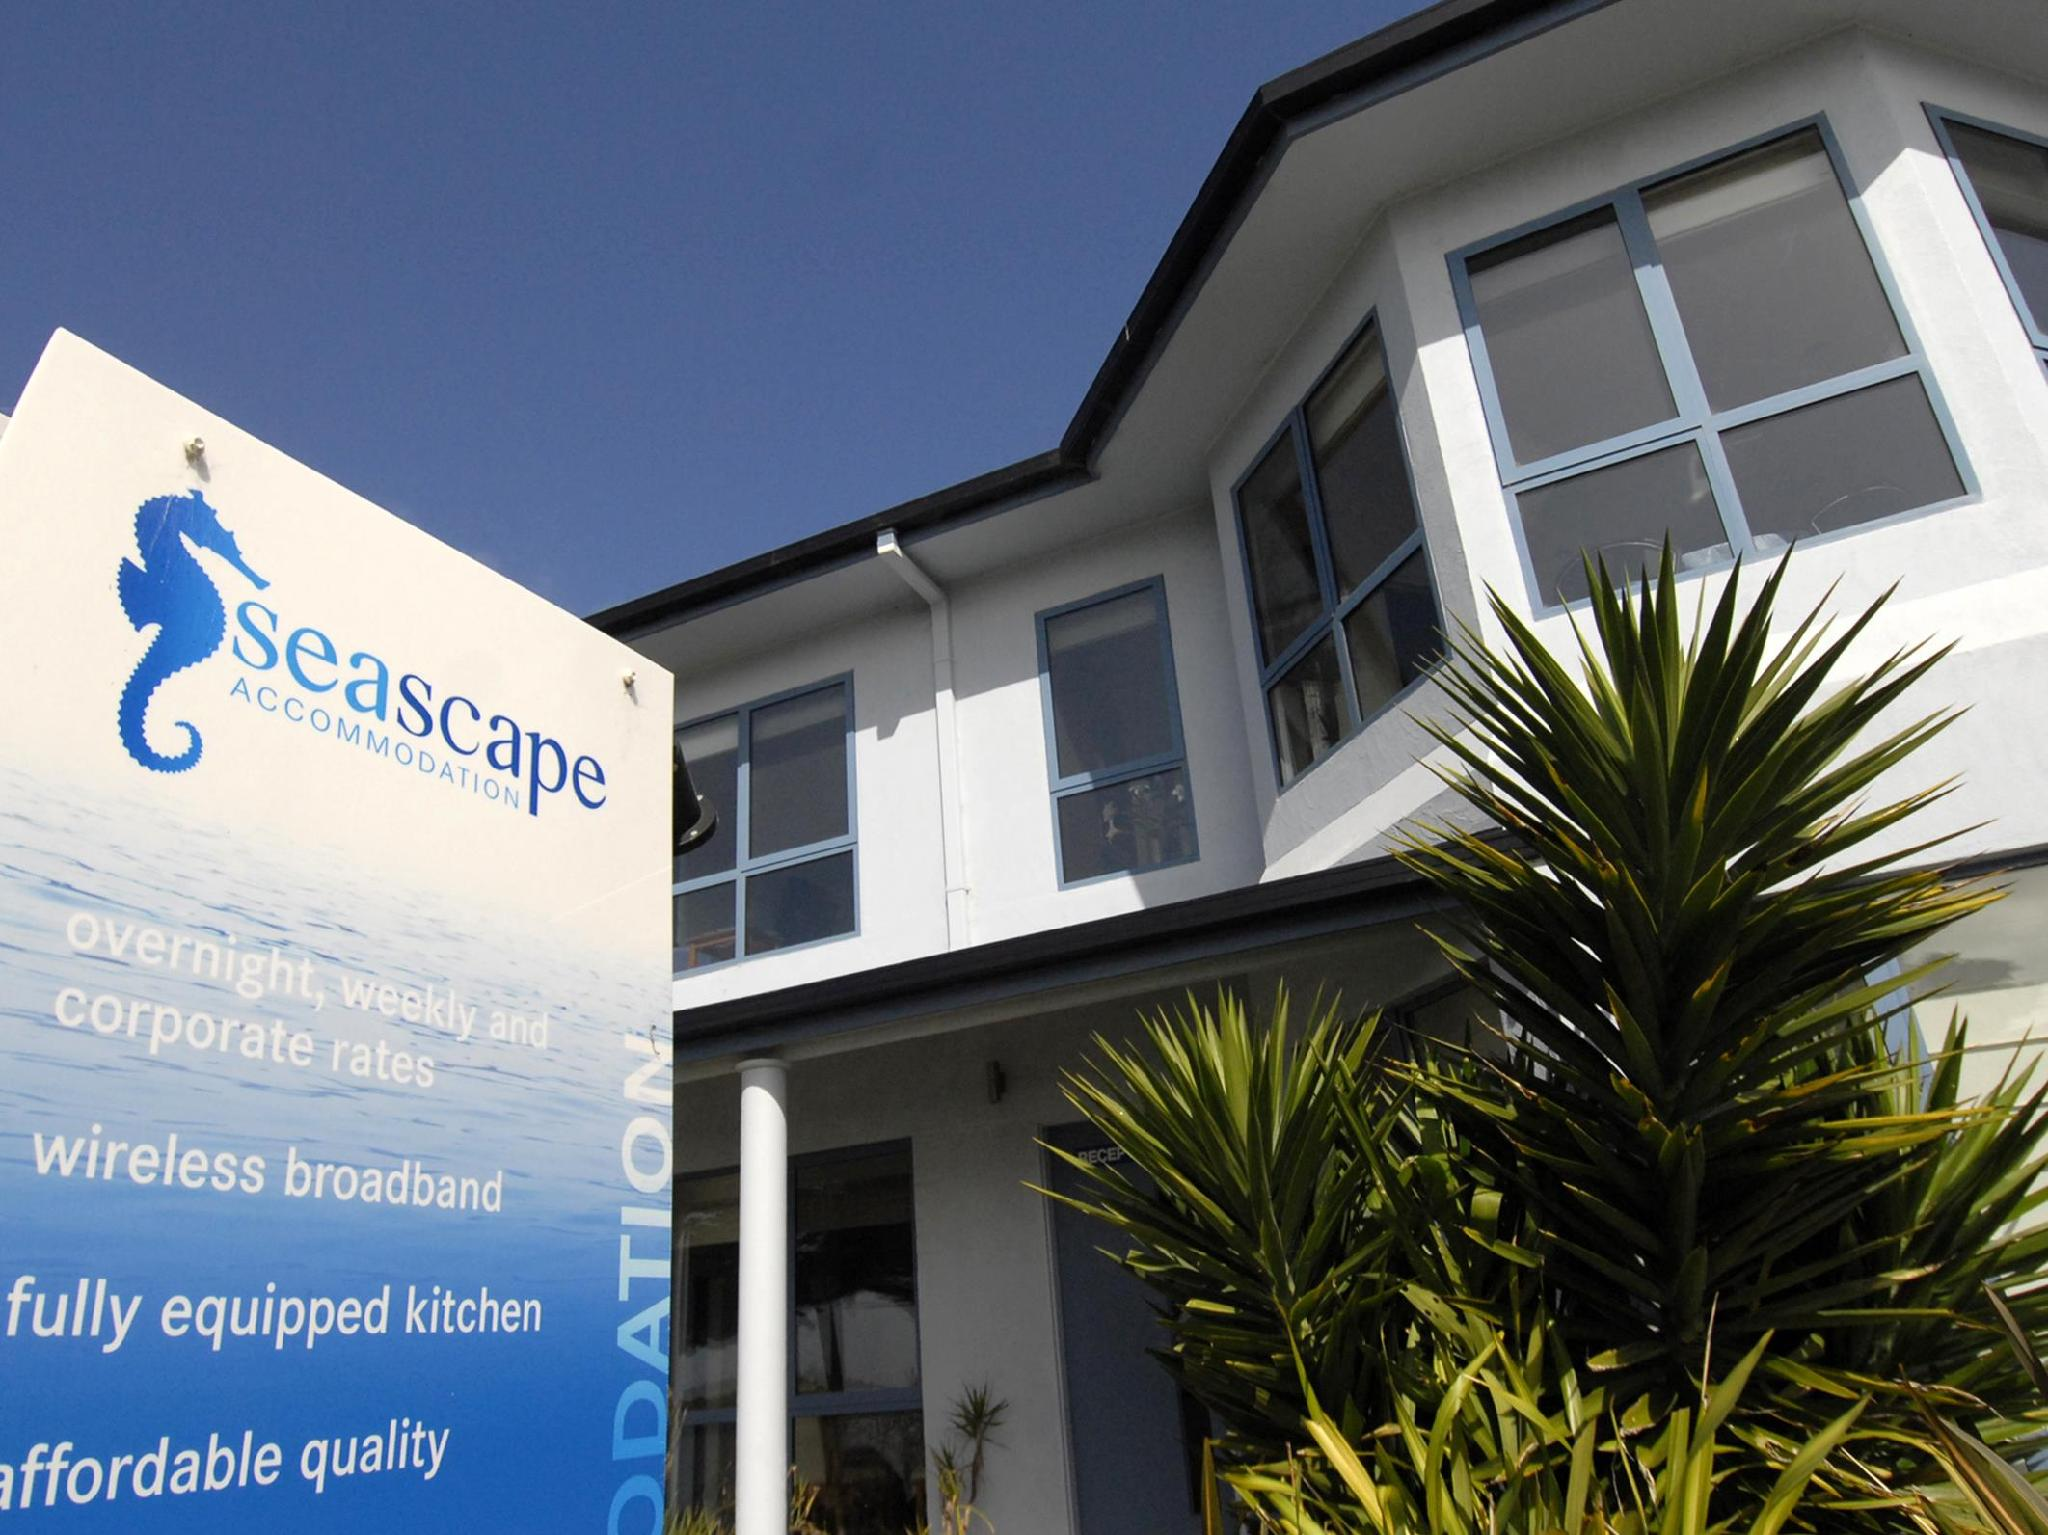 Seascape Accommodation